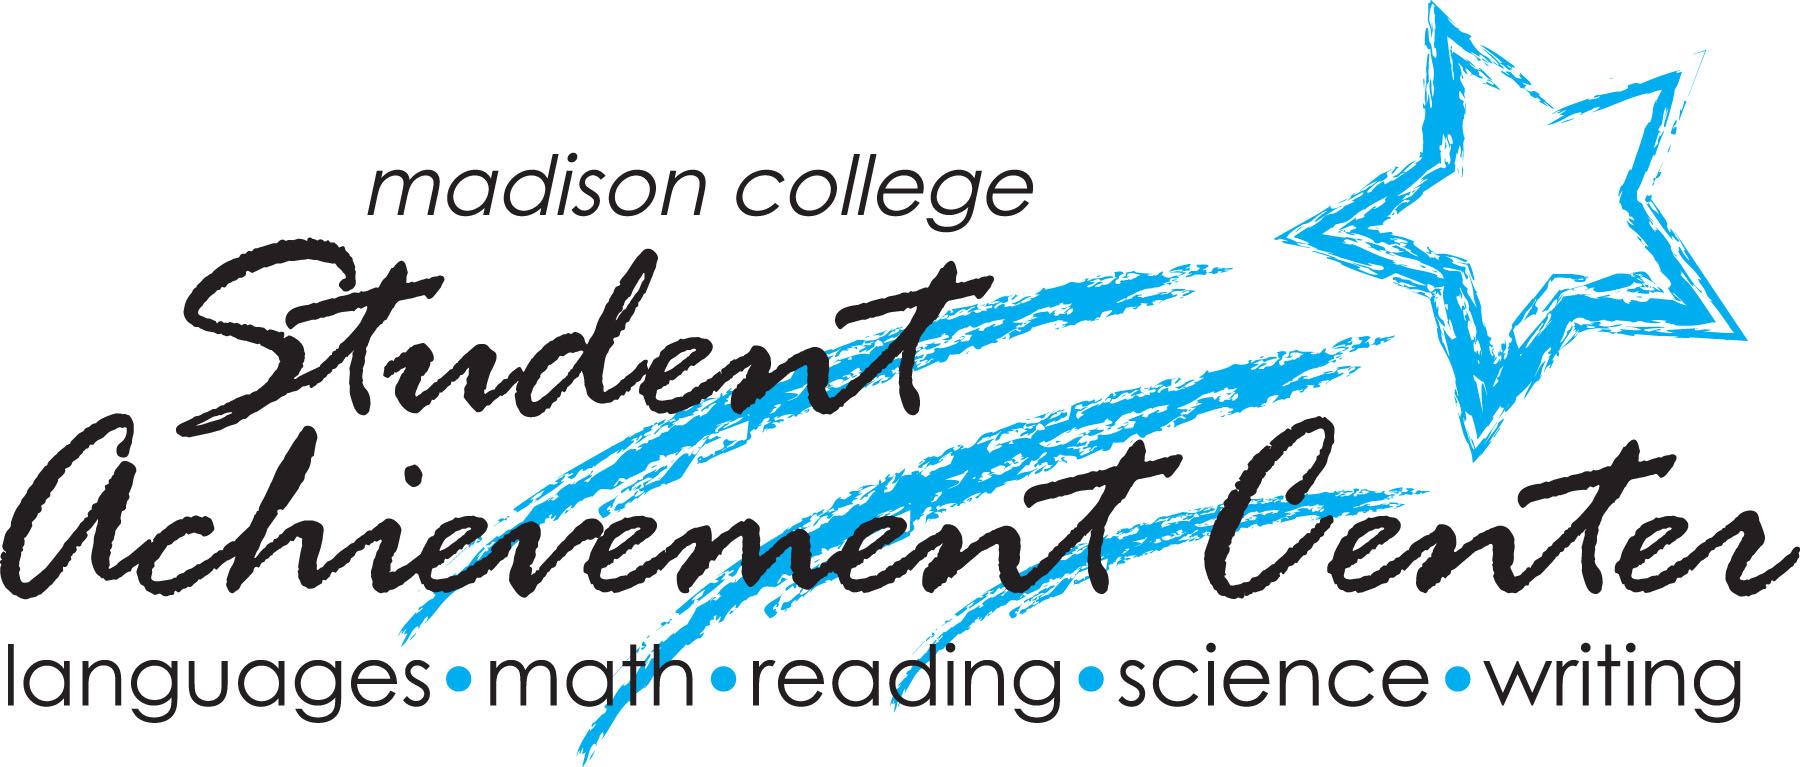 Student Achievement Cneter logo